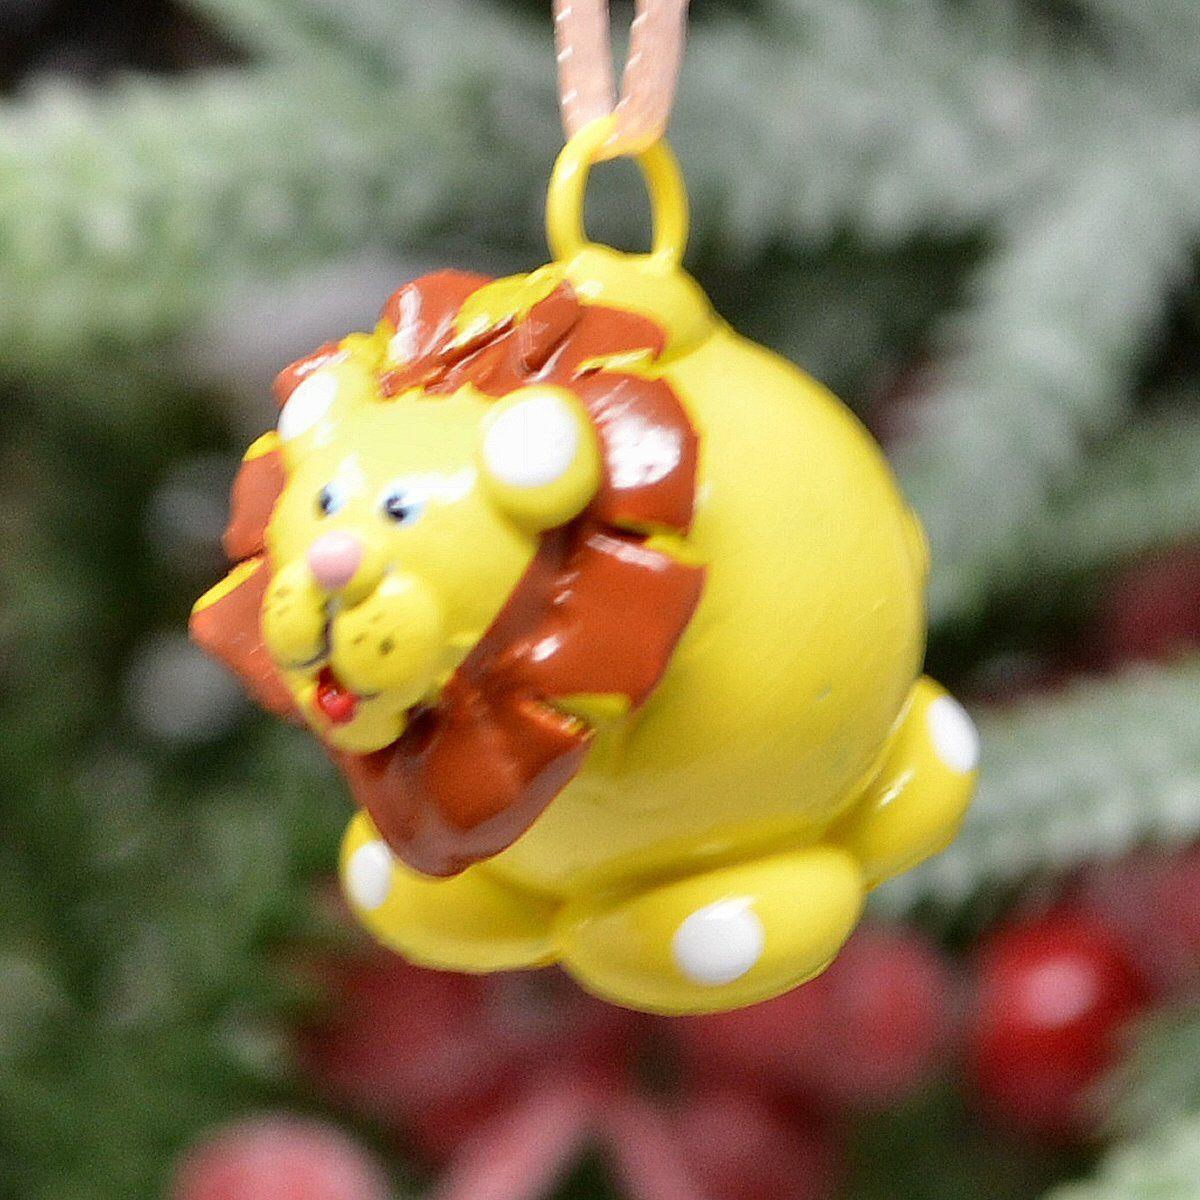 Lion Marble Ornament | Ornaments, Christmas ornaments